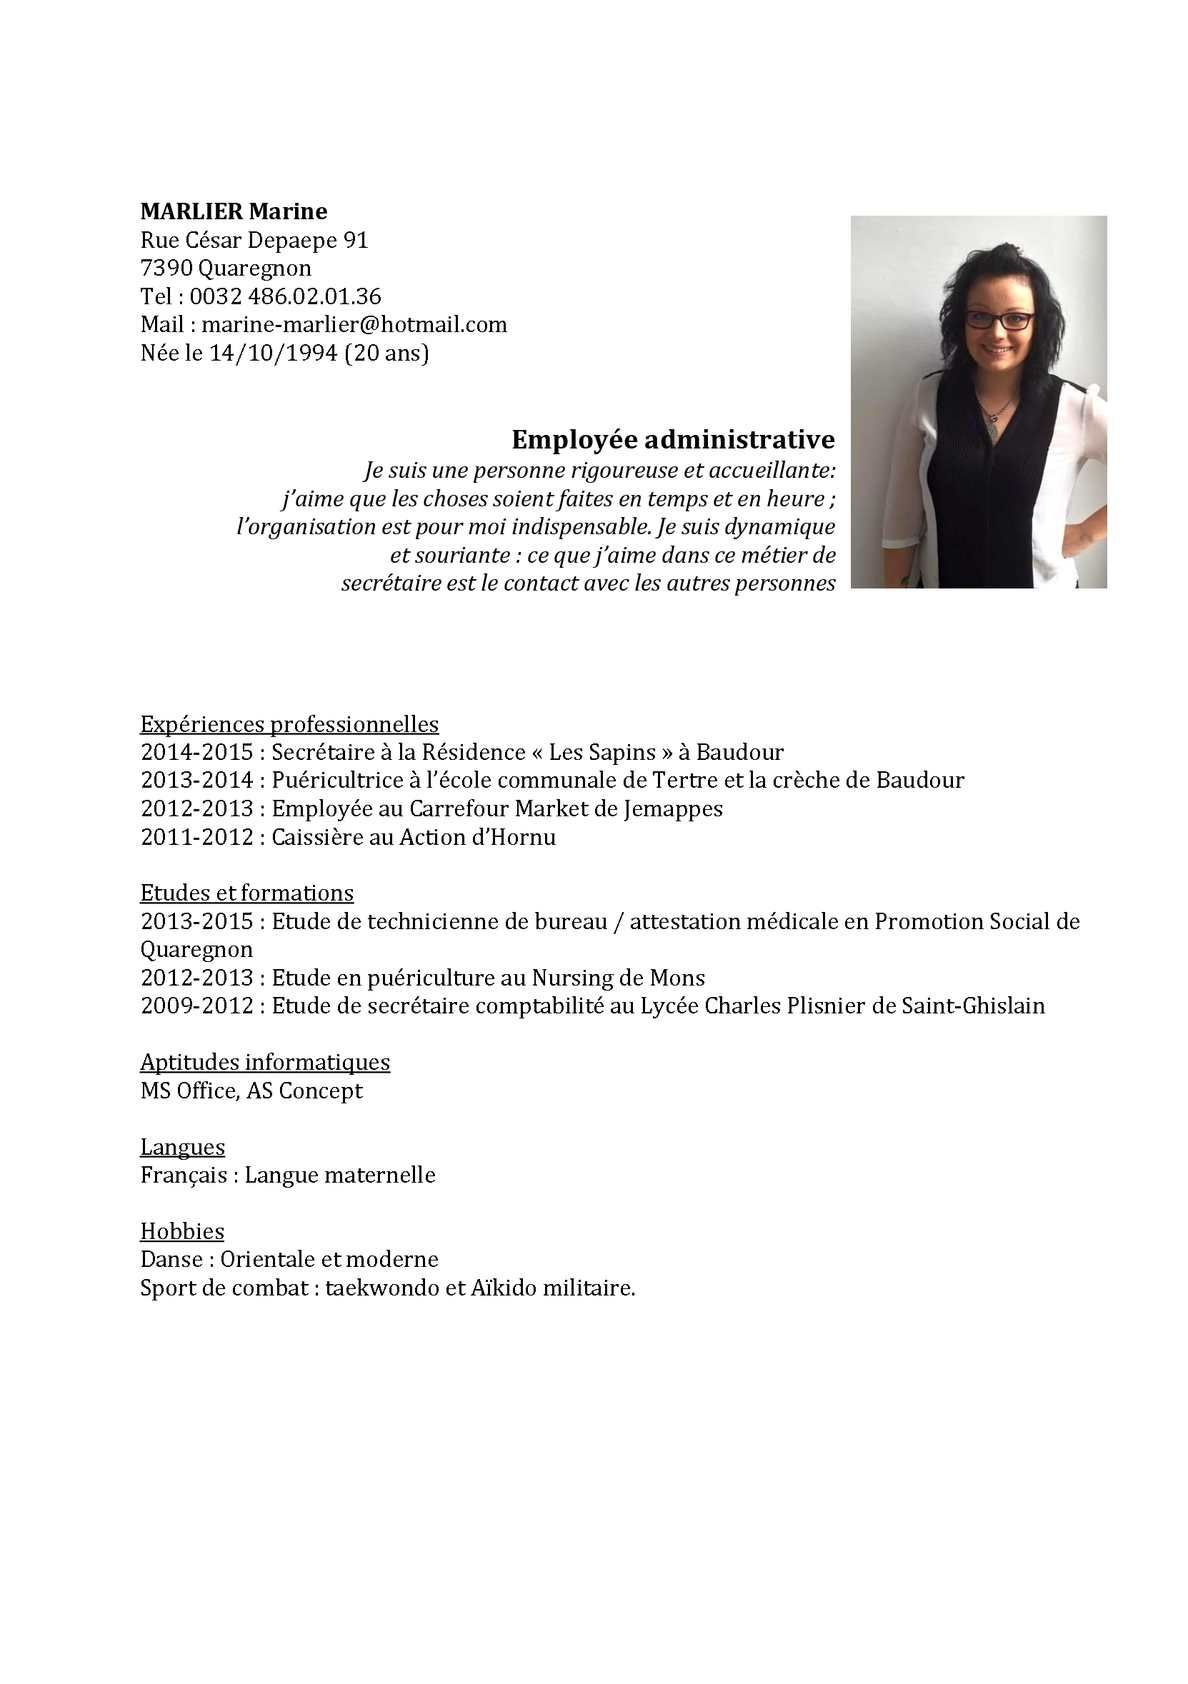 Cv Emploi Poste Marine Marlier Employe Administratif Secretaire Mons Tournai Emploi La Poste Curriculum